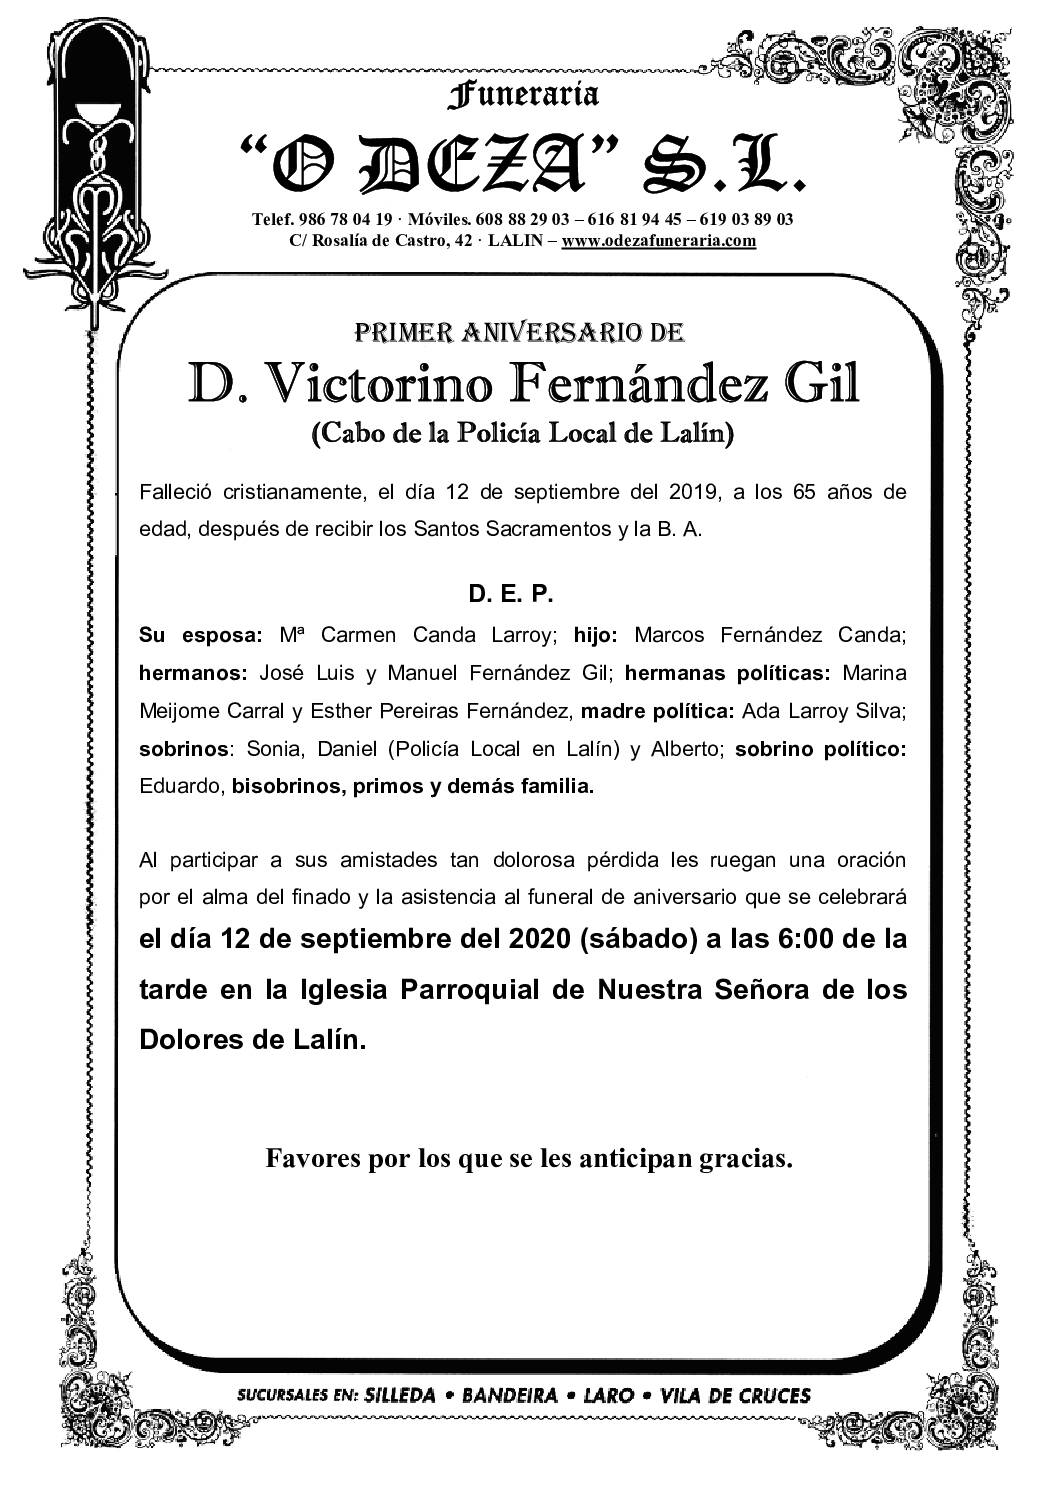 D. VICTORINO FERNÁNDEZ GIL